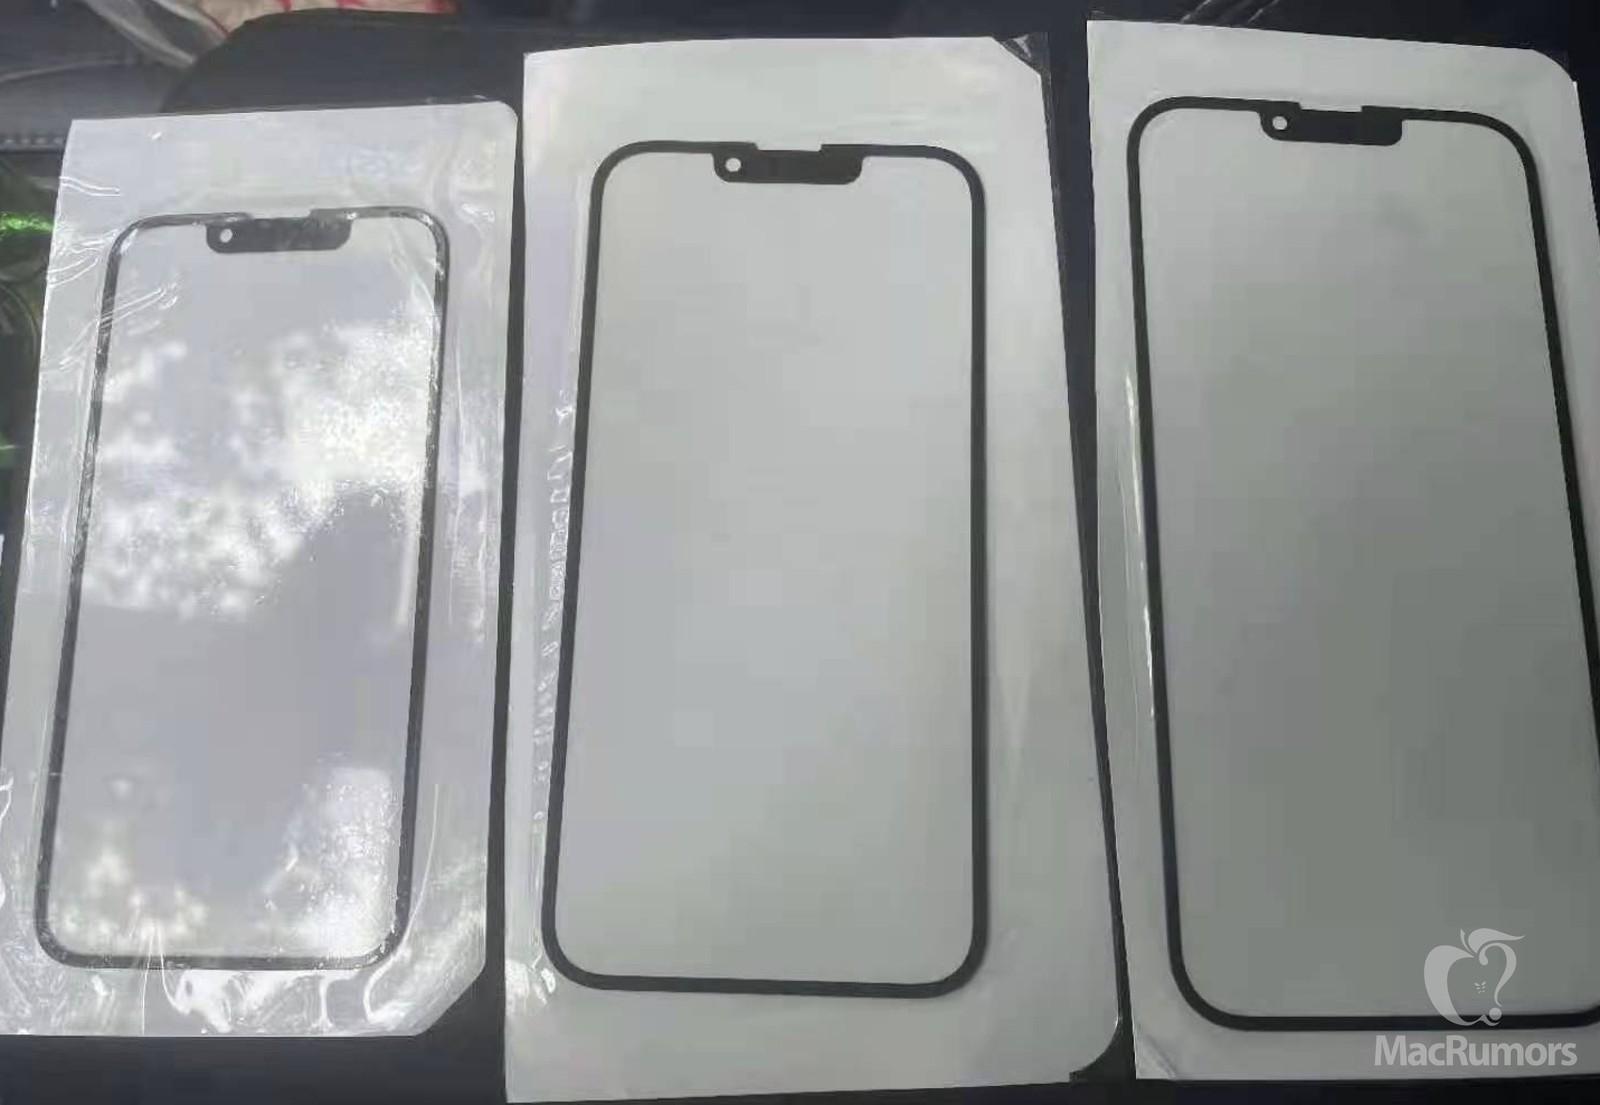 iPhone 13正面照首曝 刘海真的小了